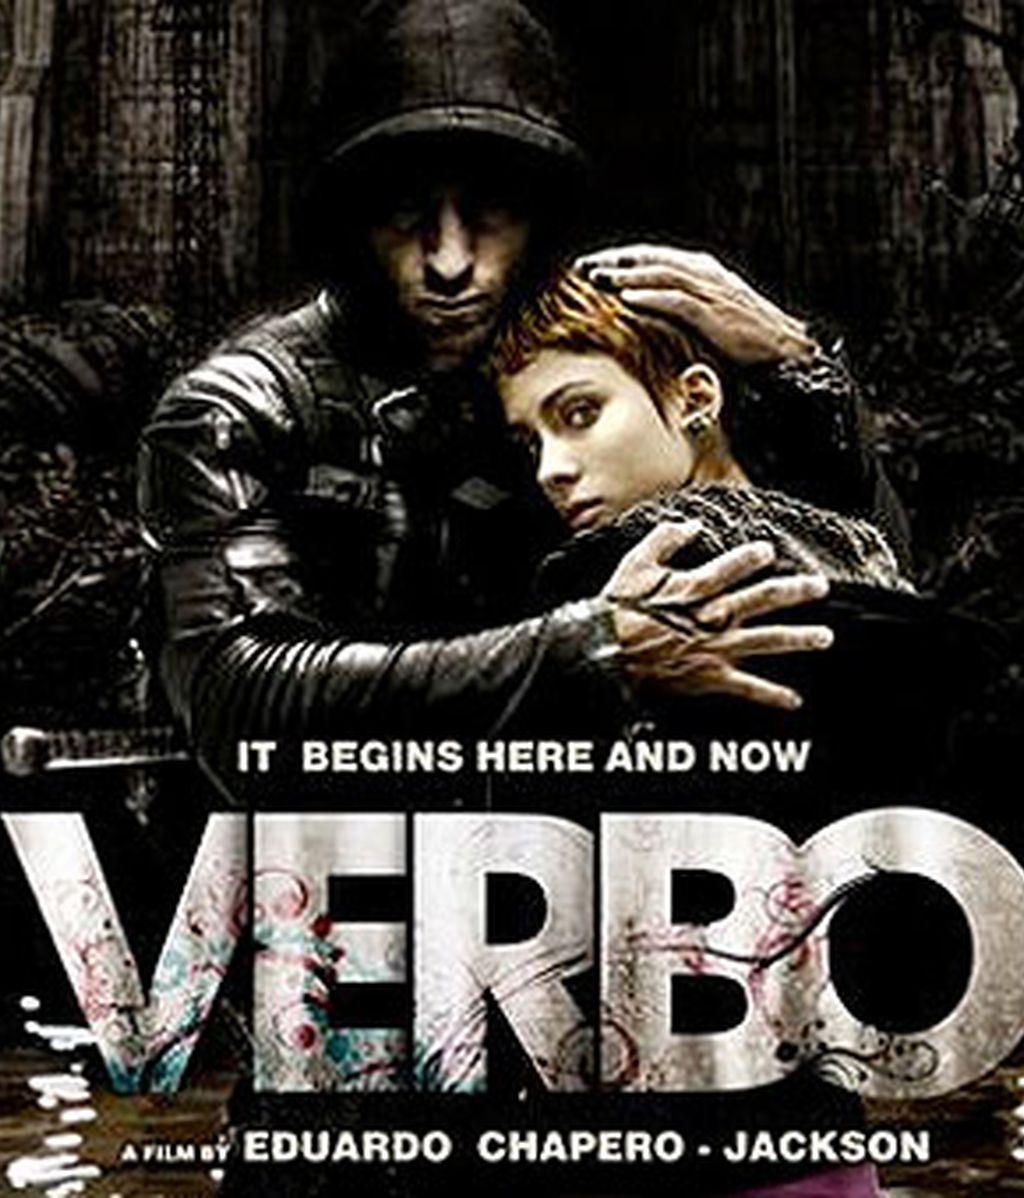 El Festival de Cine de San Sebastián presentará 'Verbo', dirigida por Eduardo Chapero Jackson